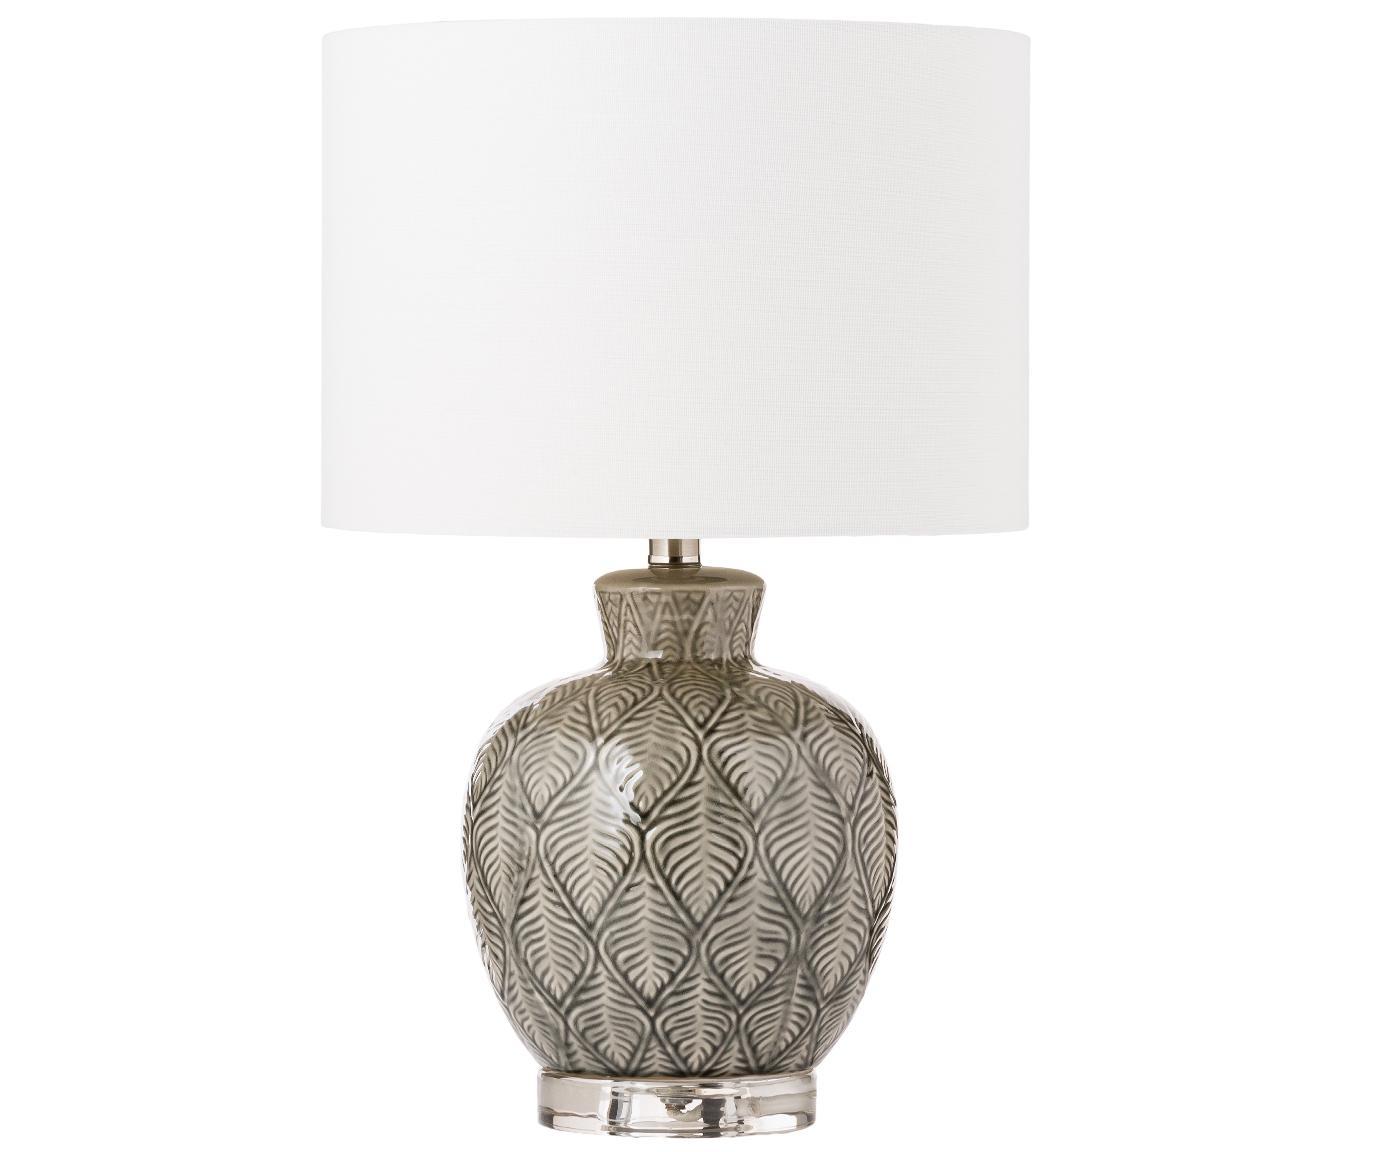 Keramik-Tischlampe Brooklyn im Boho-Style, Lampenschirm: Textil, Sockel: Kristallglas, Weiss, Grau, Ø 33 x H 53 cm